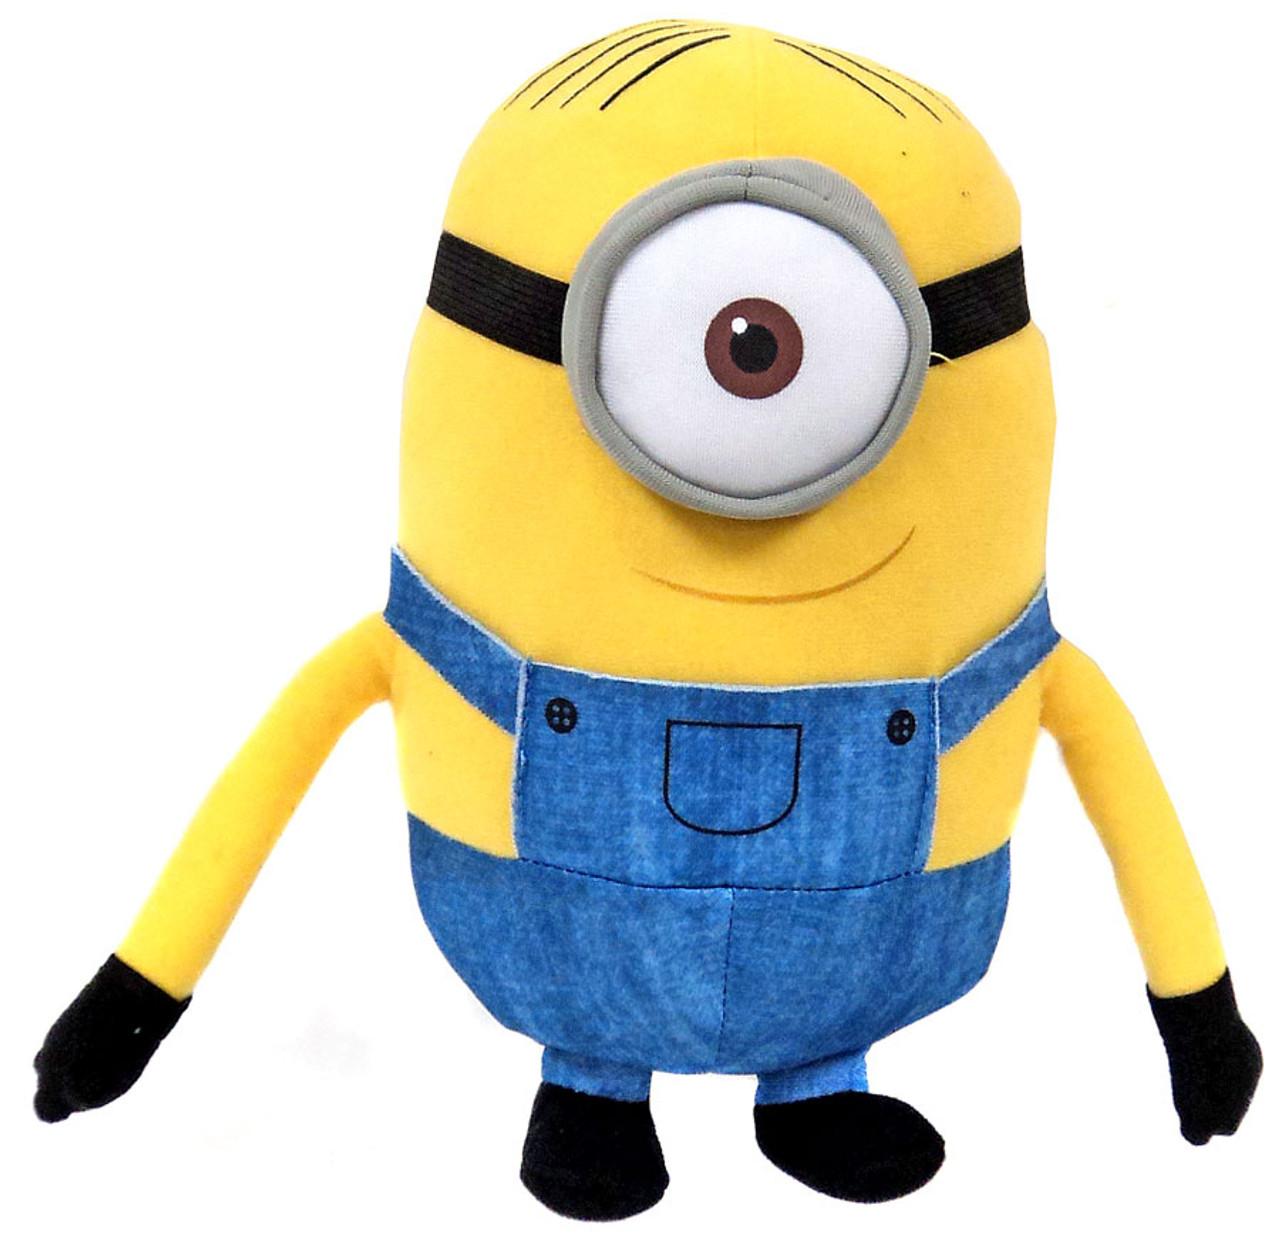 Despicable Me Minions Movie Minion Stuart 10 Plush Figure